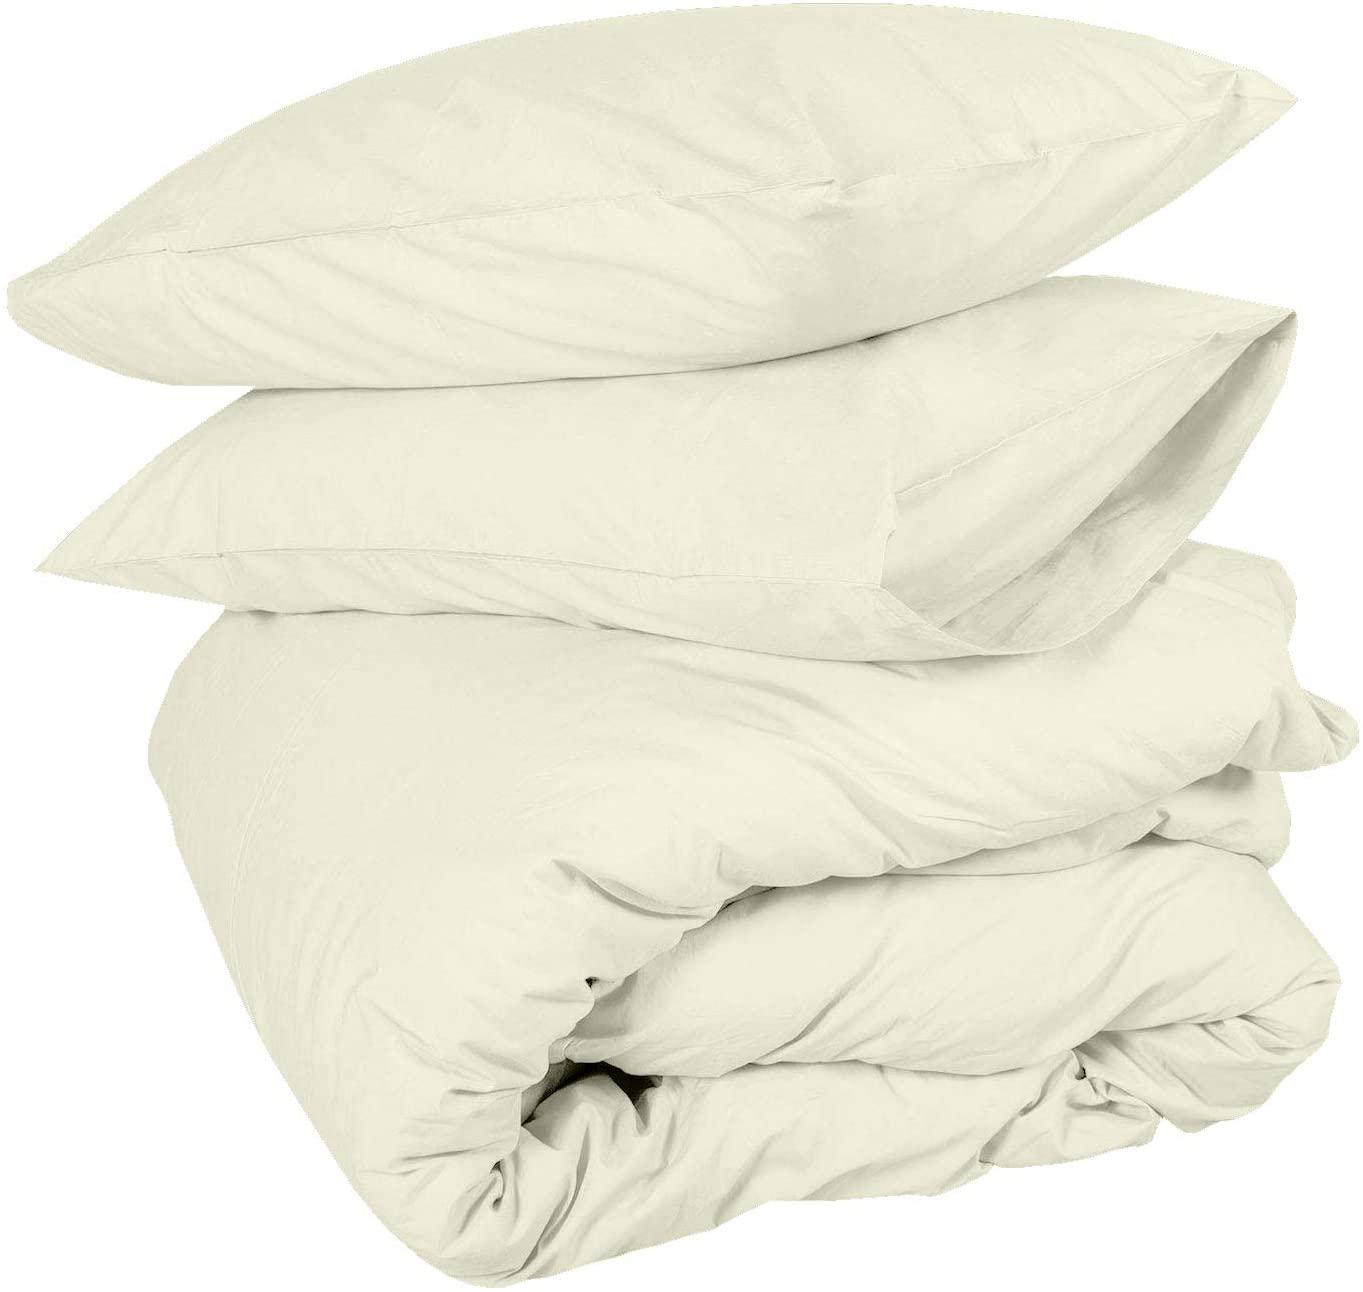 Duvet Cover set King Oversize 120X98 Ivory Comforter Cover Bedding 3 Pieces Duvet Set (1 Duvet Cover + 2 Pillow Covers) 400 Thread Count Zipper Closure Duvet Cover(Oversize King 120X98, Ivory Solid)